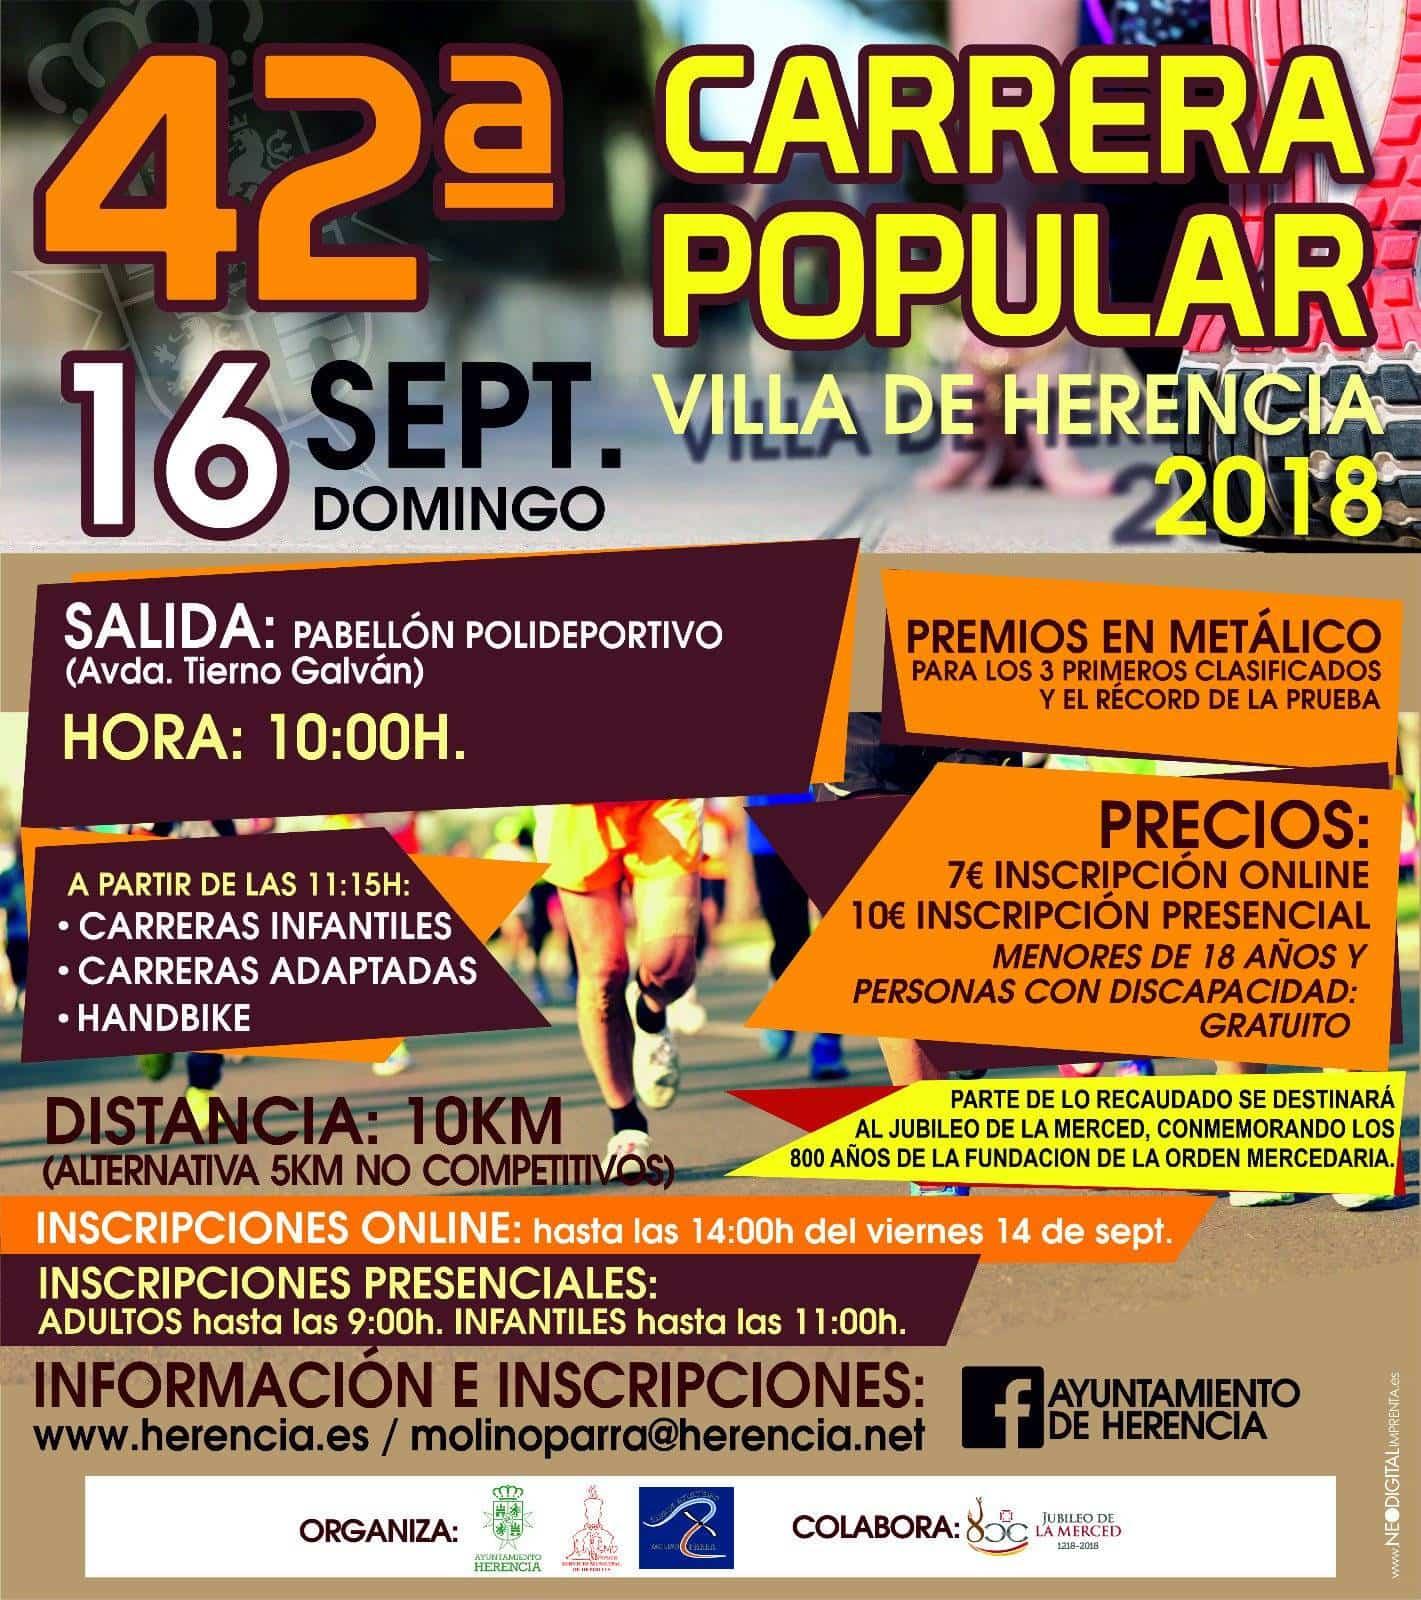 "42 carrera popular villa herencia 2018 - Presentada la 42 Carrera Popular ""Villa de Herencia"""